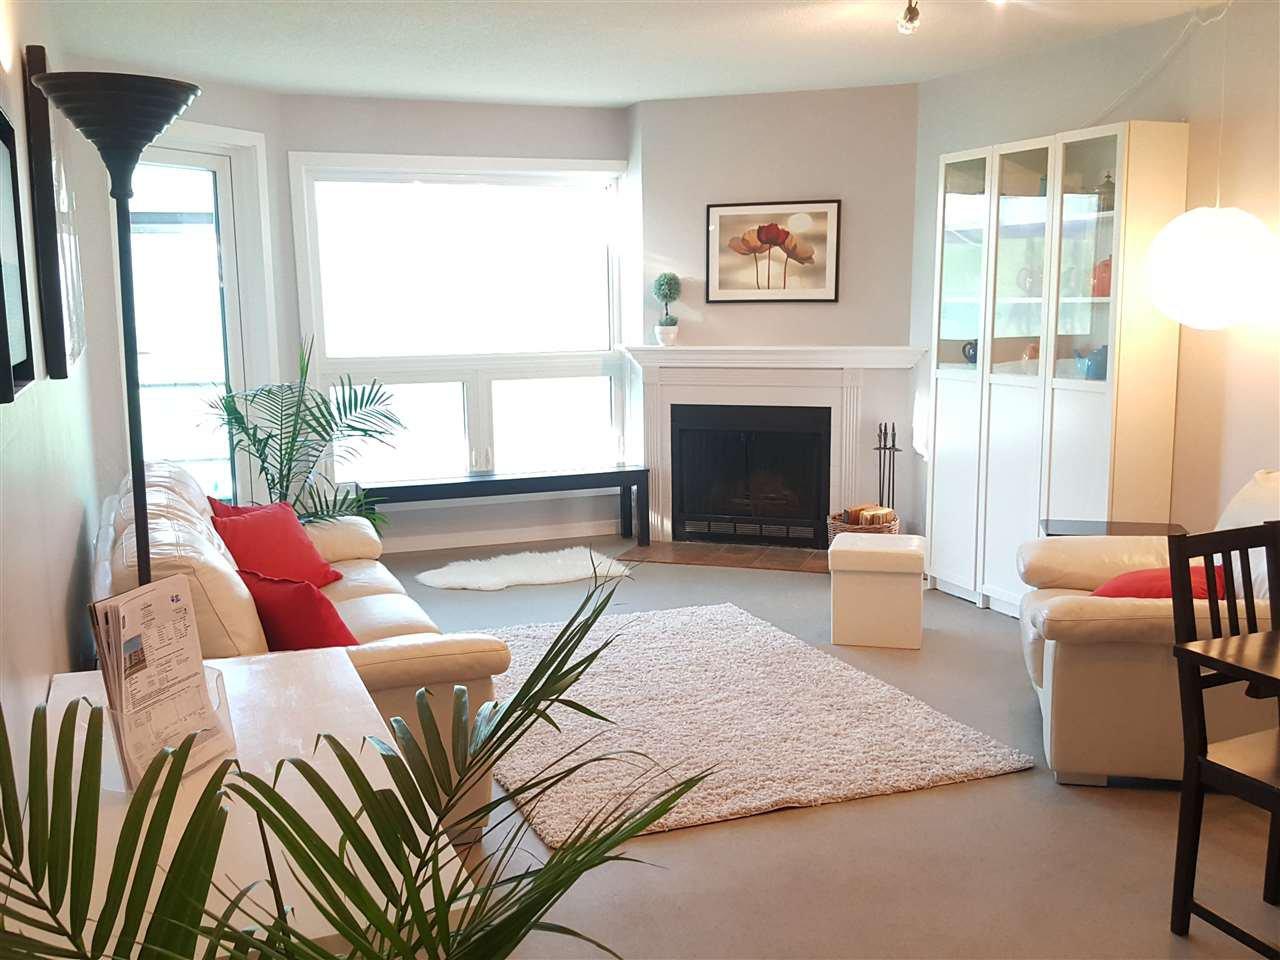 "Main Photo: 203 607 E 8TH Avenue in Vancouver: Mount Pleasant VE Condo for sale in ""MIRASOL"" (Vancouver East)  : MLS®# R2374774"